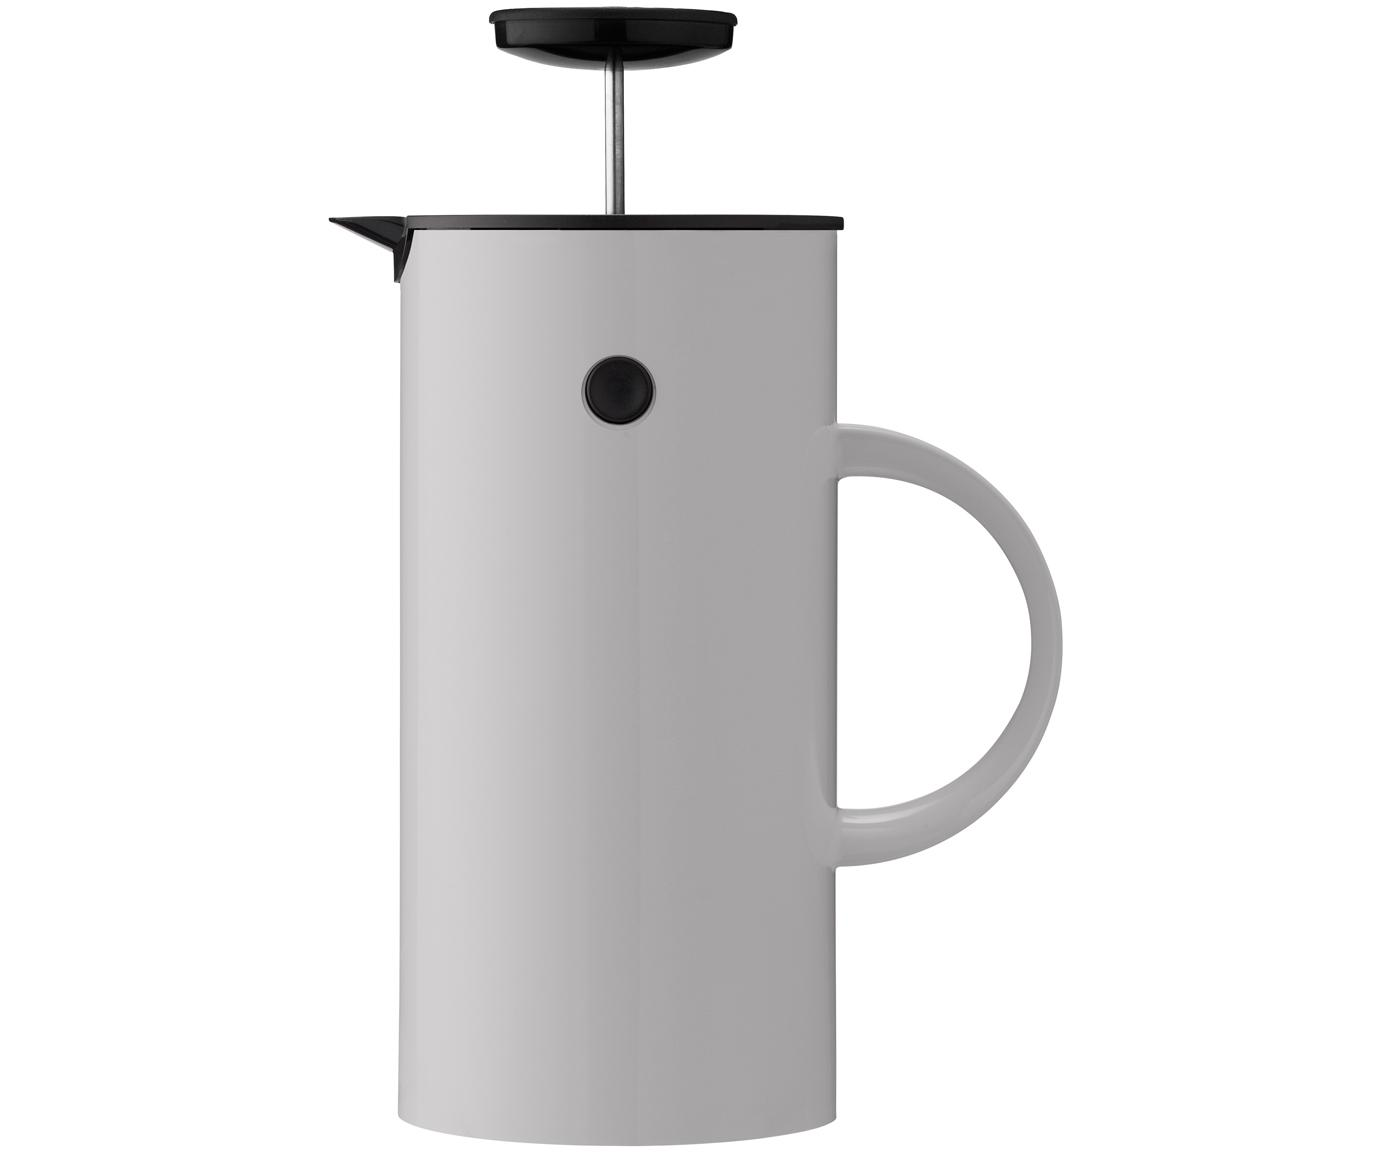 Cafetière  EM in grijs, Lichtgrijs, 1 l